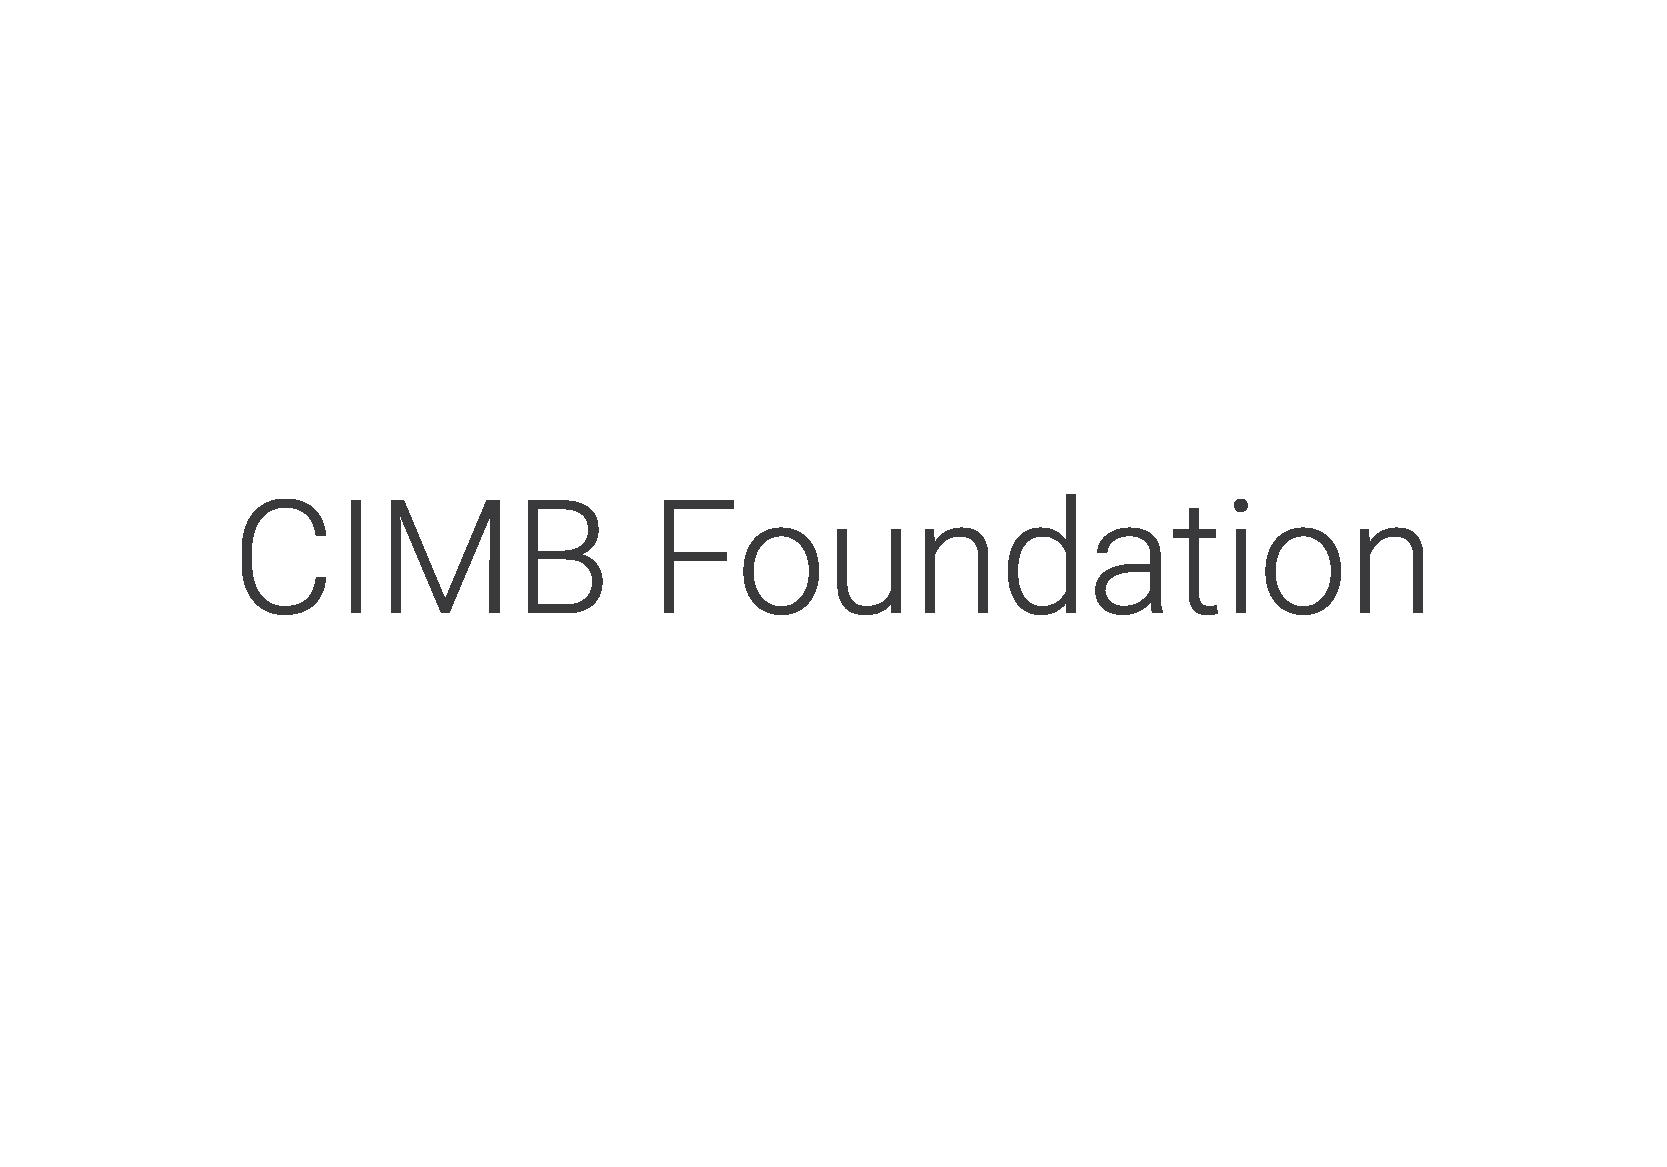 CIMB Foundation